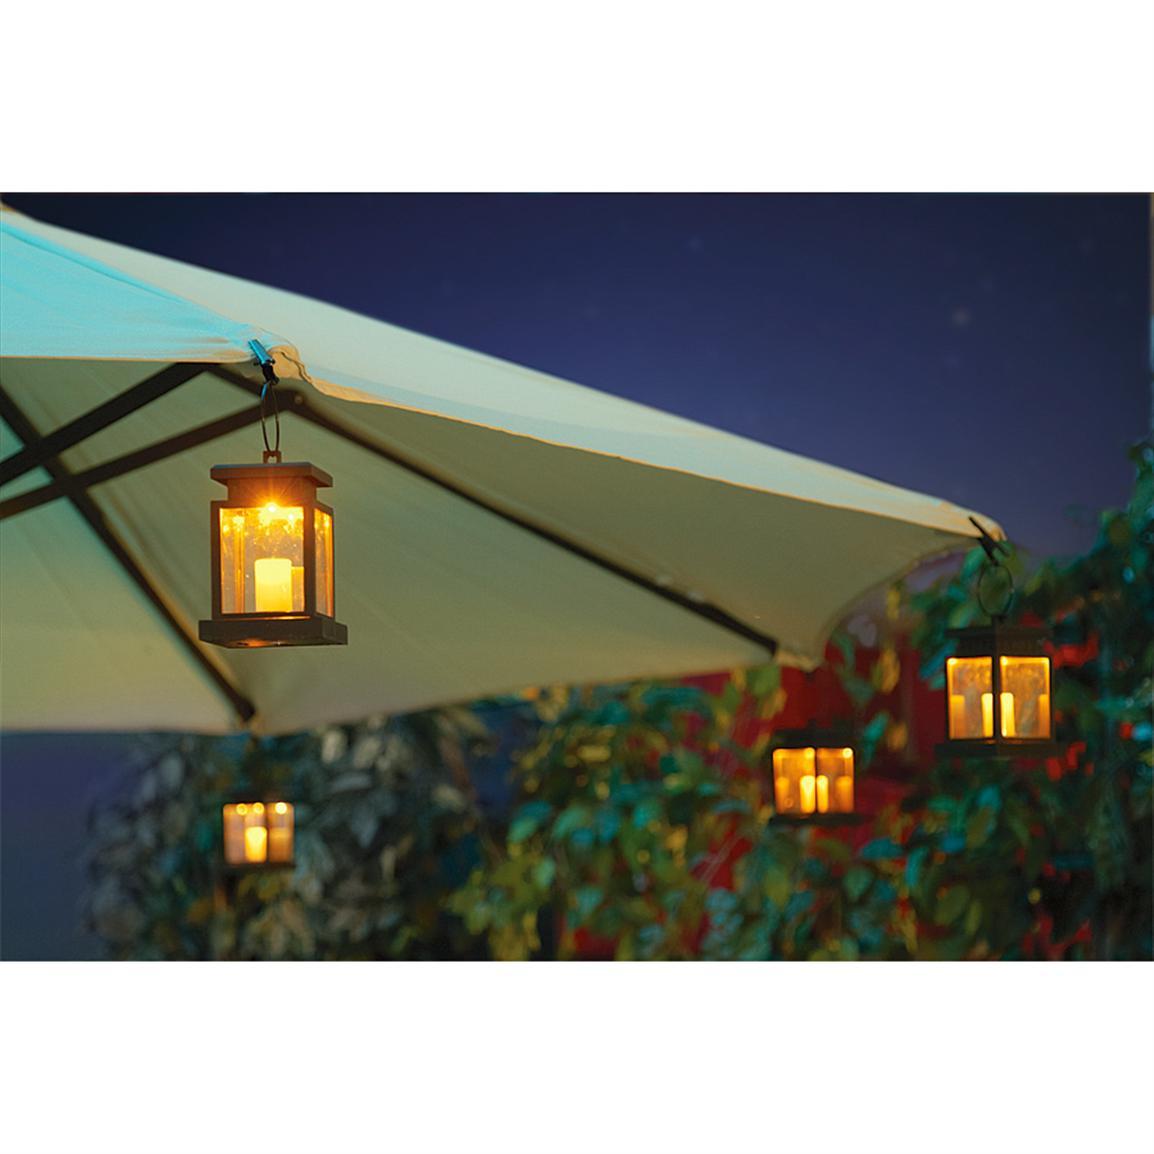 patio umbrella lights outdoor light for patio umbrella light set and extraordinary patio umbrella DZVGTML